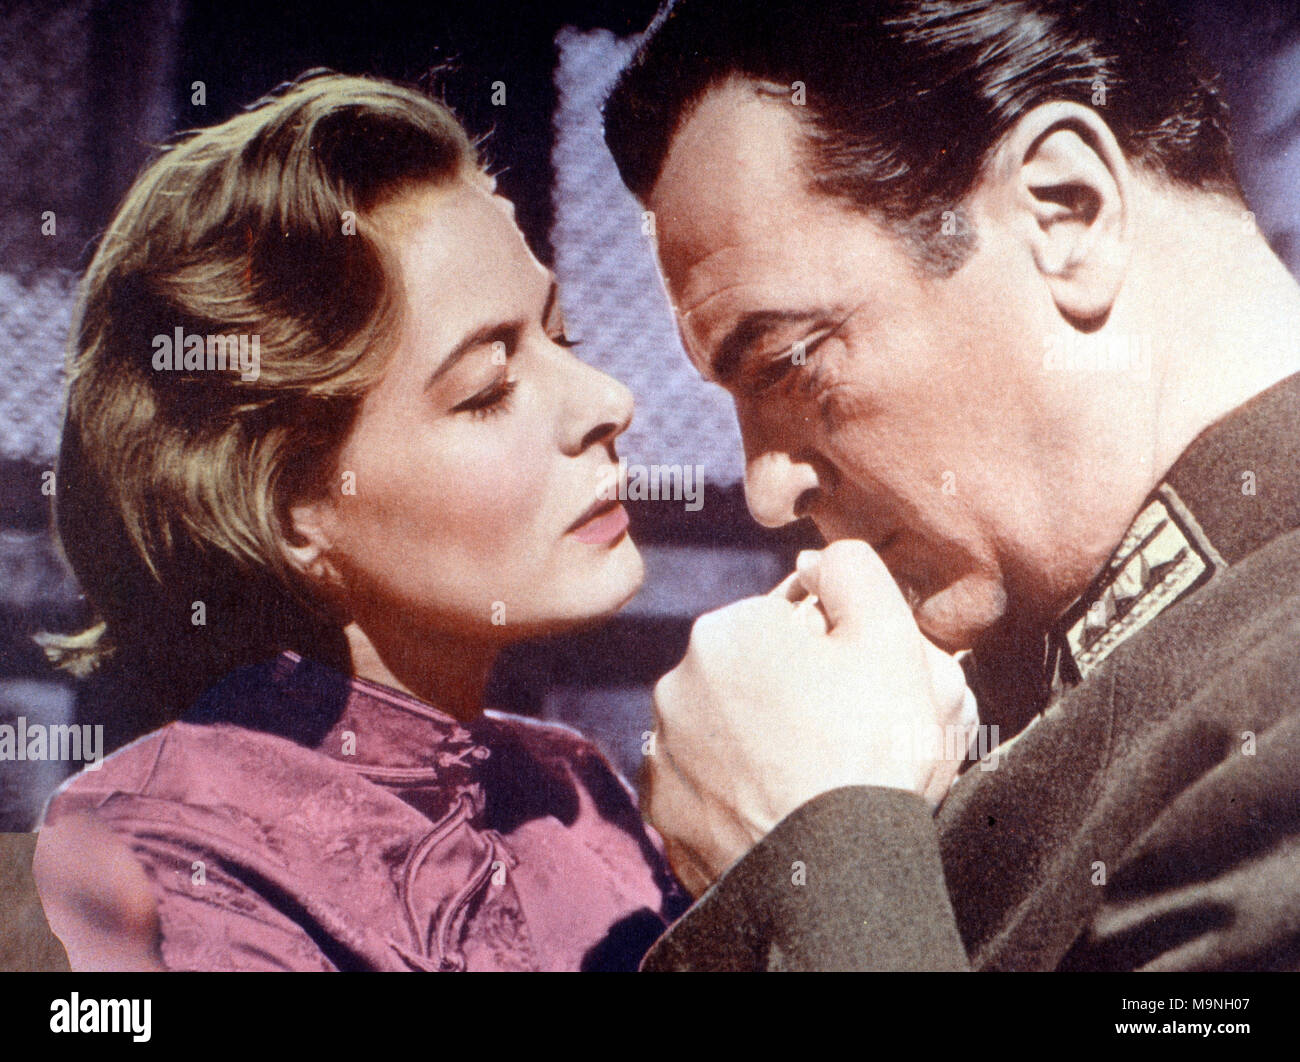 The Inn of the Sixth Happiness, aka: Die Herberge zur sechsen Glückseligkeit, USA 1958, Regie: Mark Robson, Darsteller: Ingrid Bergman, Curd Jürgens Stock Photo